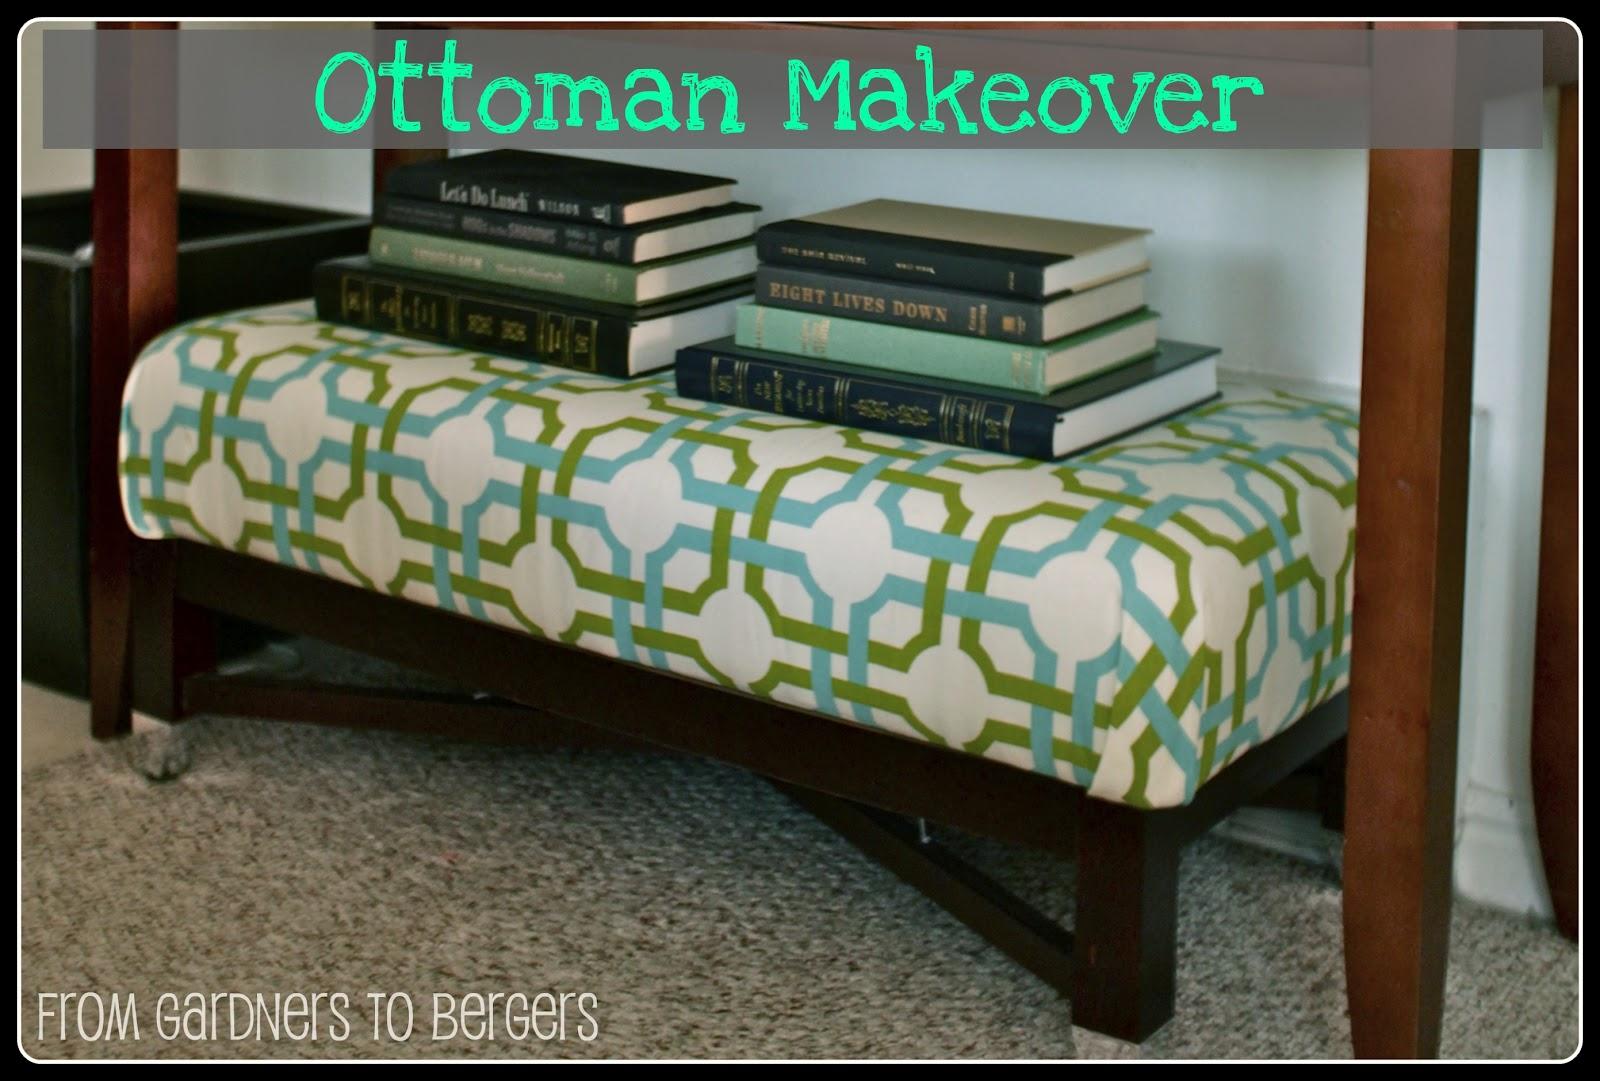 Ottoman-Makeover